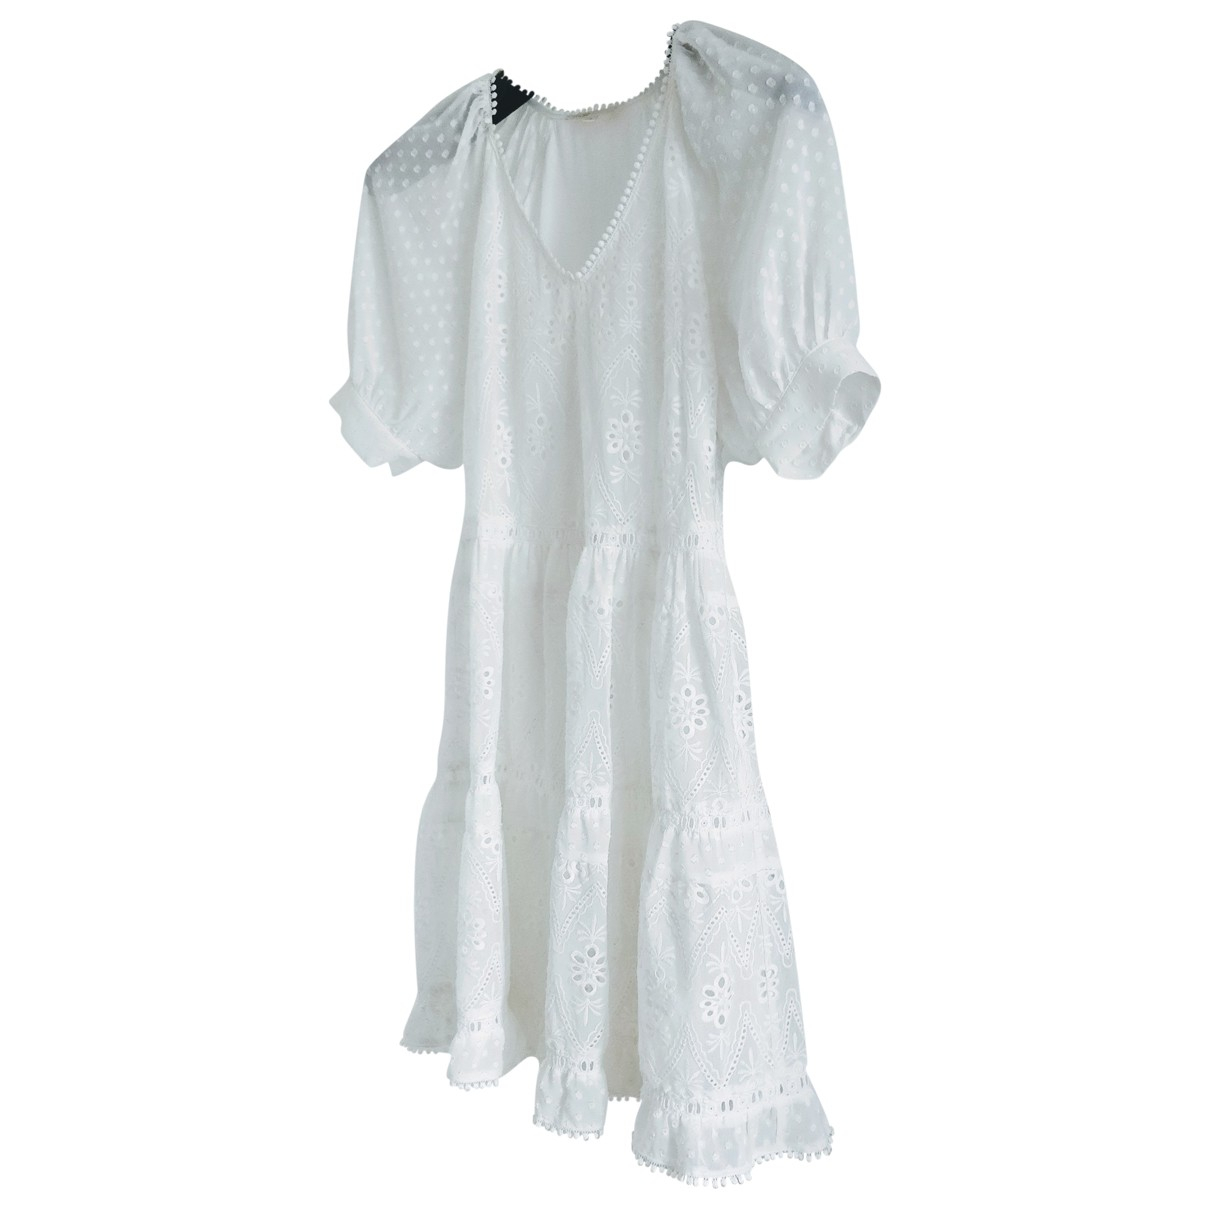 Maje Spring Summer 2019 White Lace dress for Women 36 FR